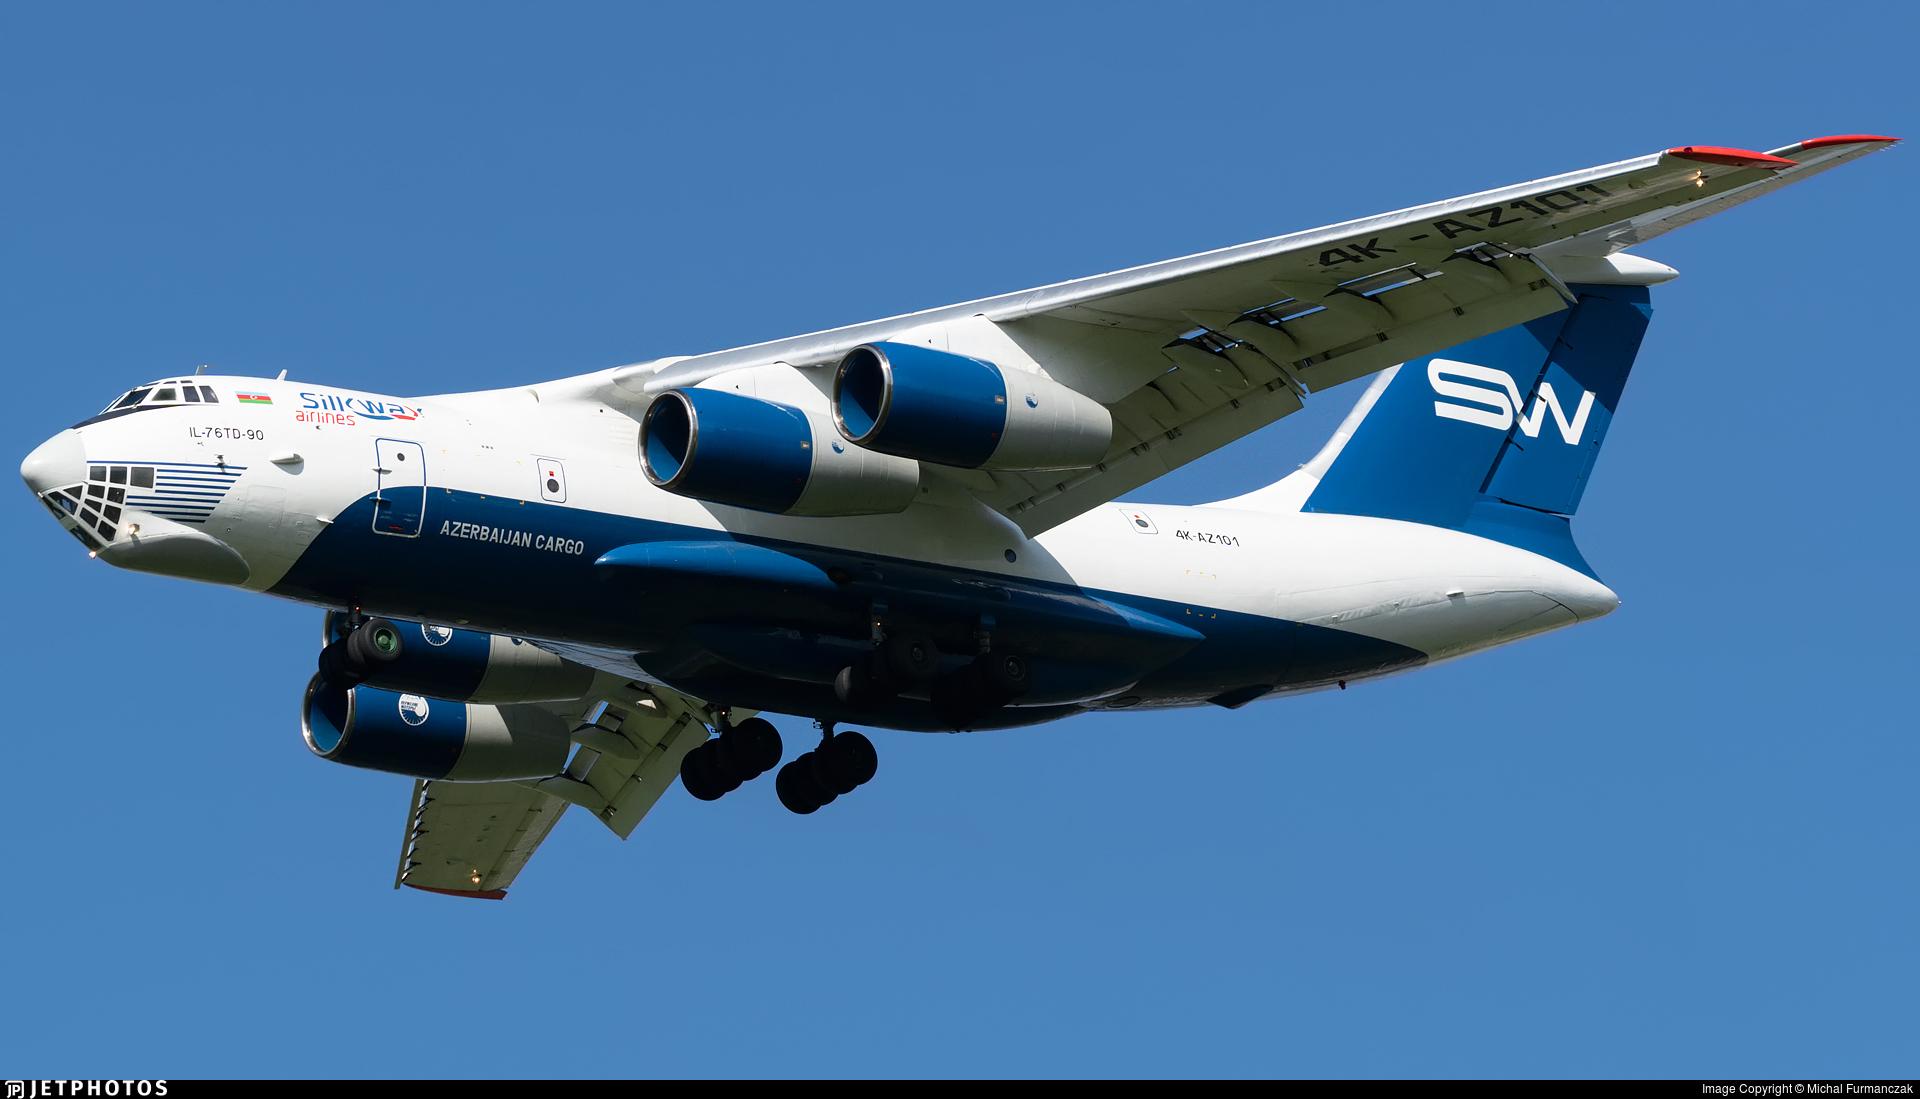 4K-AZ101 - Ilyushin IL-76TD-90VD - Silk Way Airlines